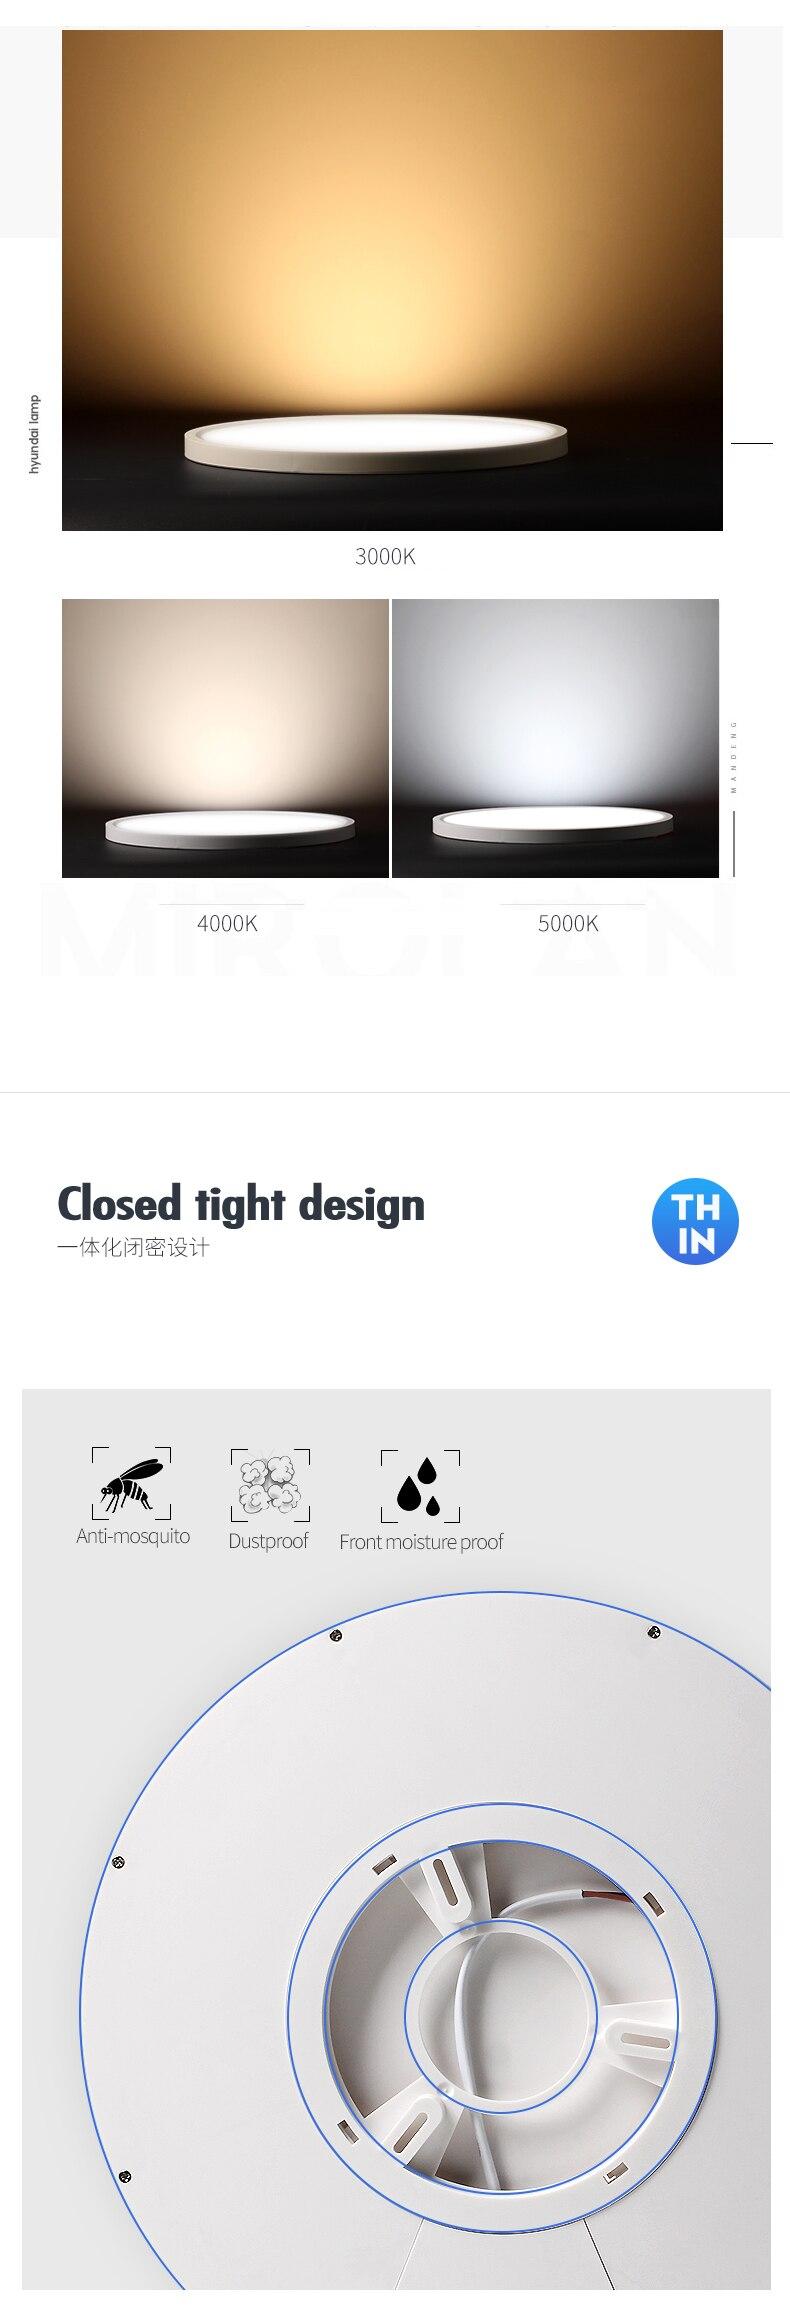 H70cb364ae16647869d3cecff614ac7bf0 Modern LED Ceiling Light 12W 18W 24W 32W 220V 5000K Kitchen Bedroom Bathroom Lamps Ultrathin Ceiling Lamp